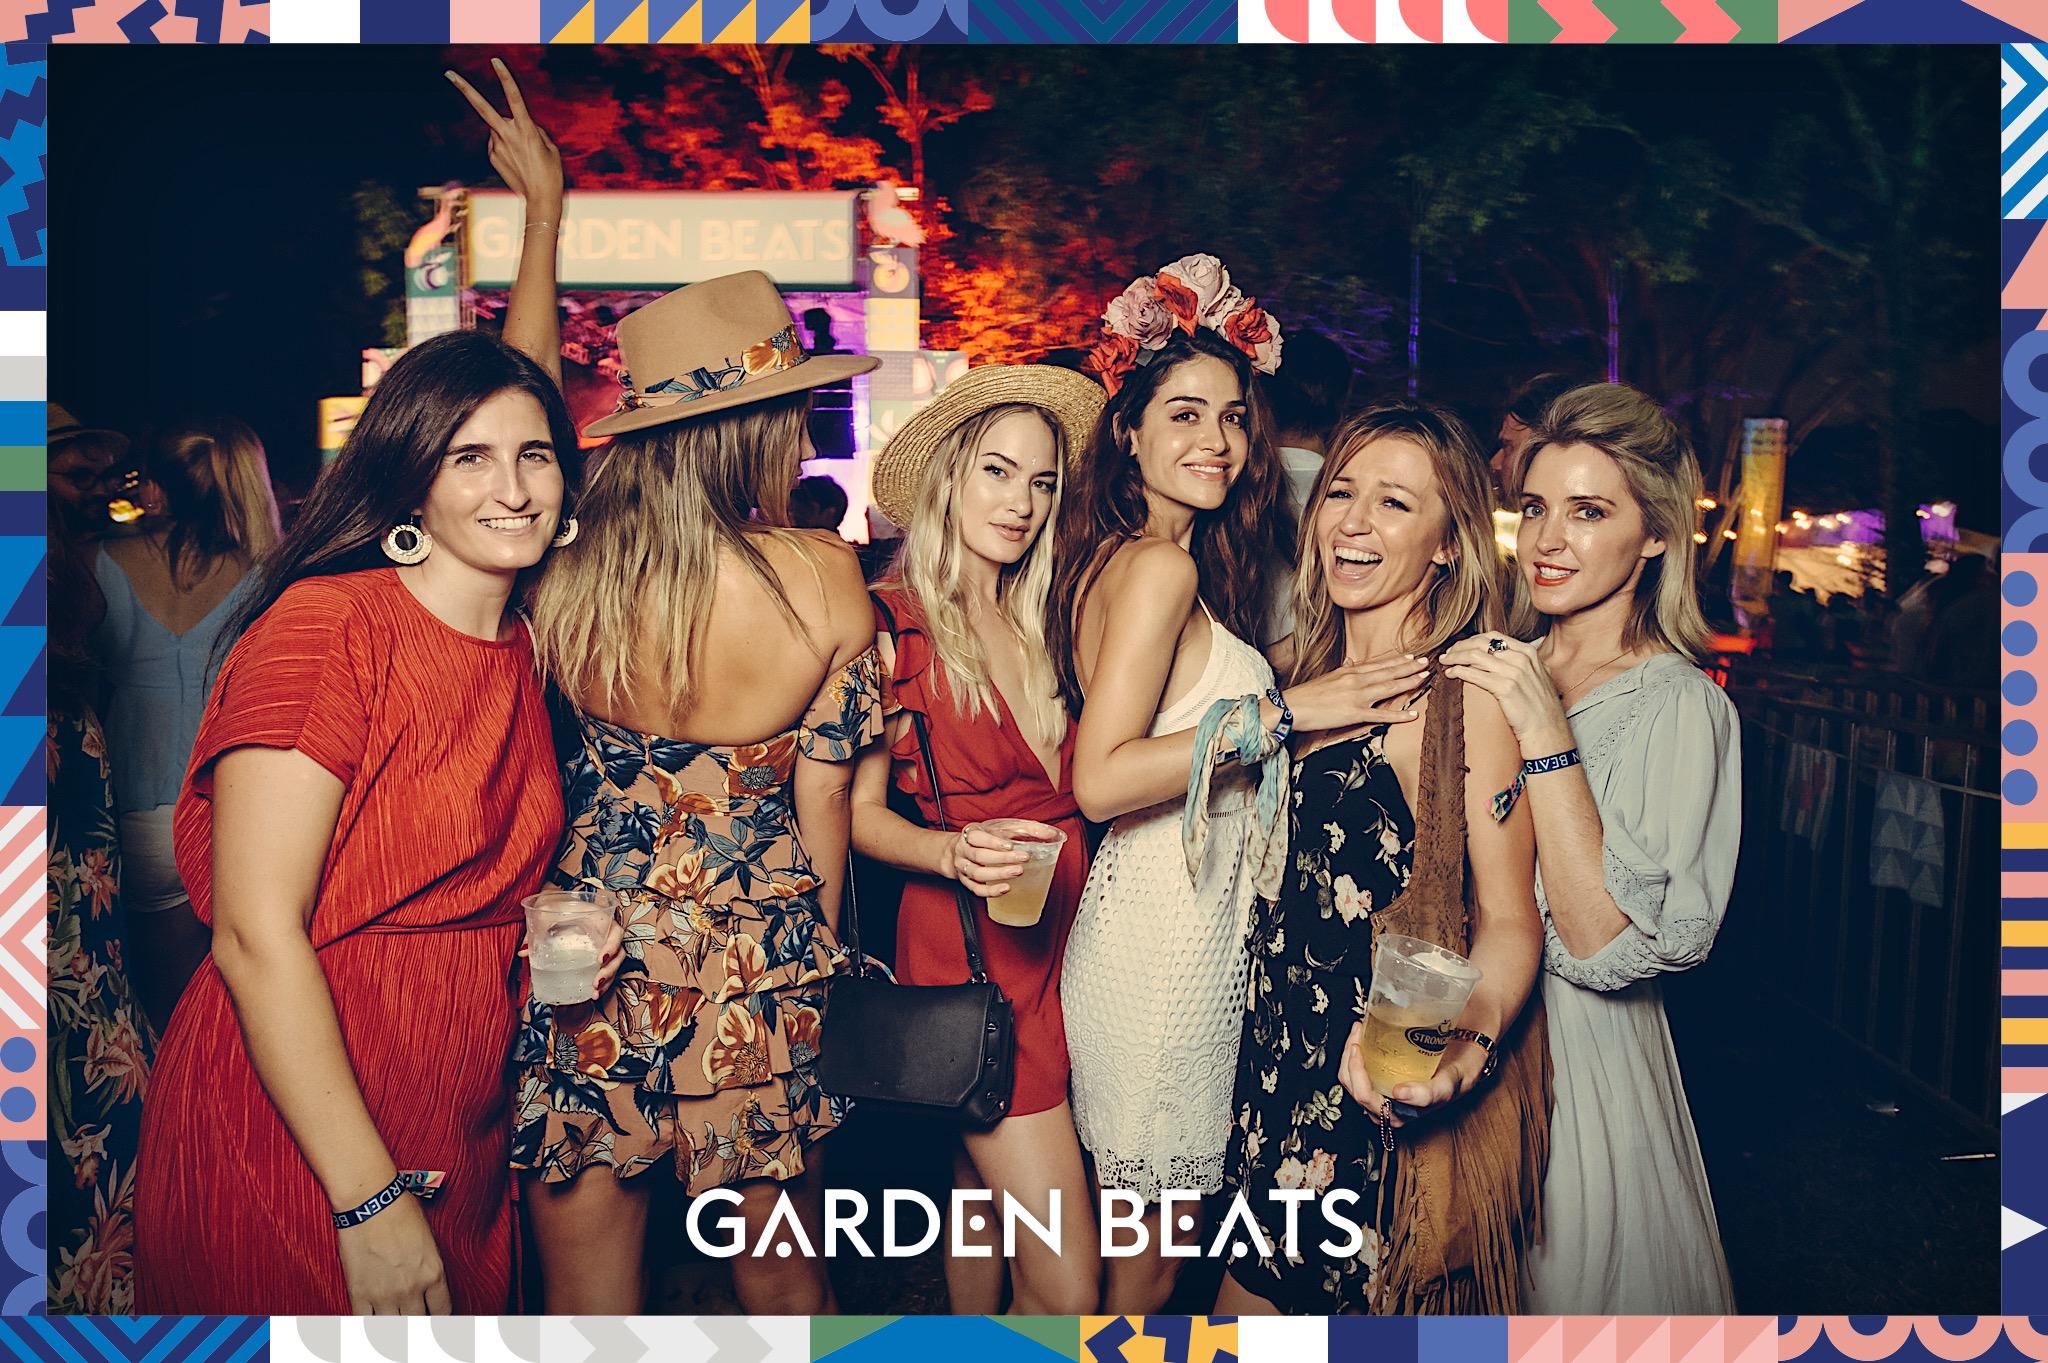 03032018_GardenBeats_Colossal838_Watermarked.jpg